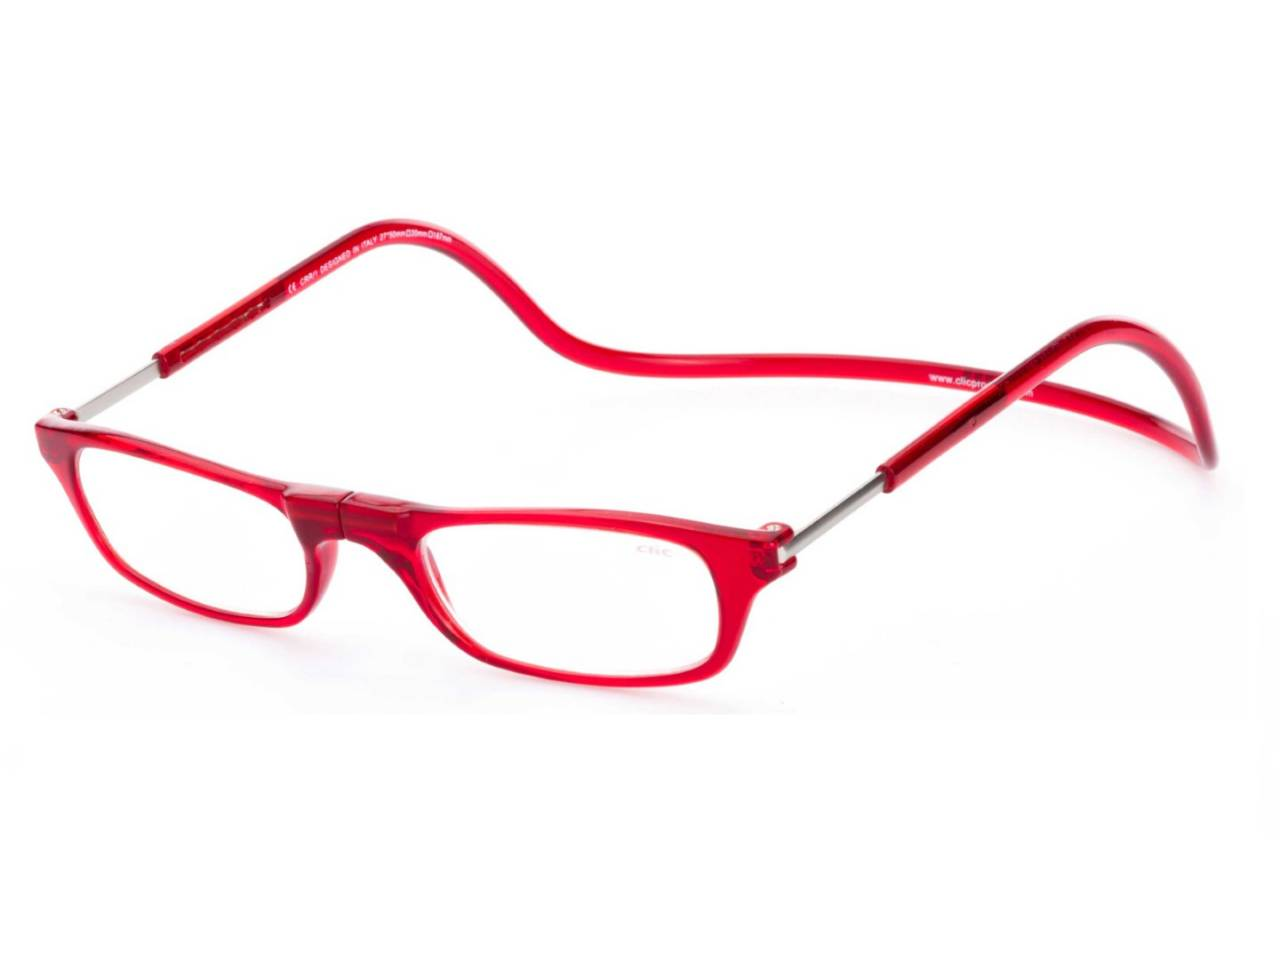 Очки CliC Vision Red - Фото №7